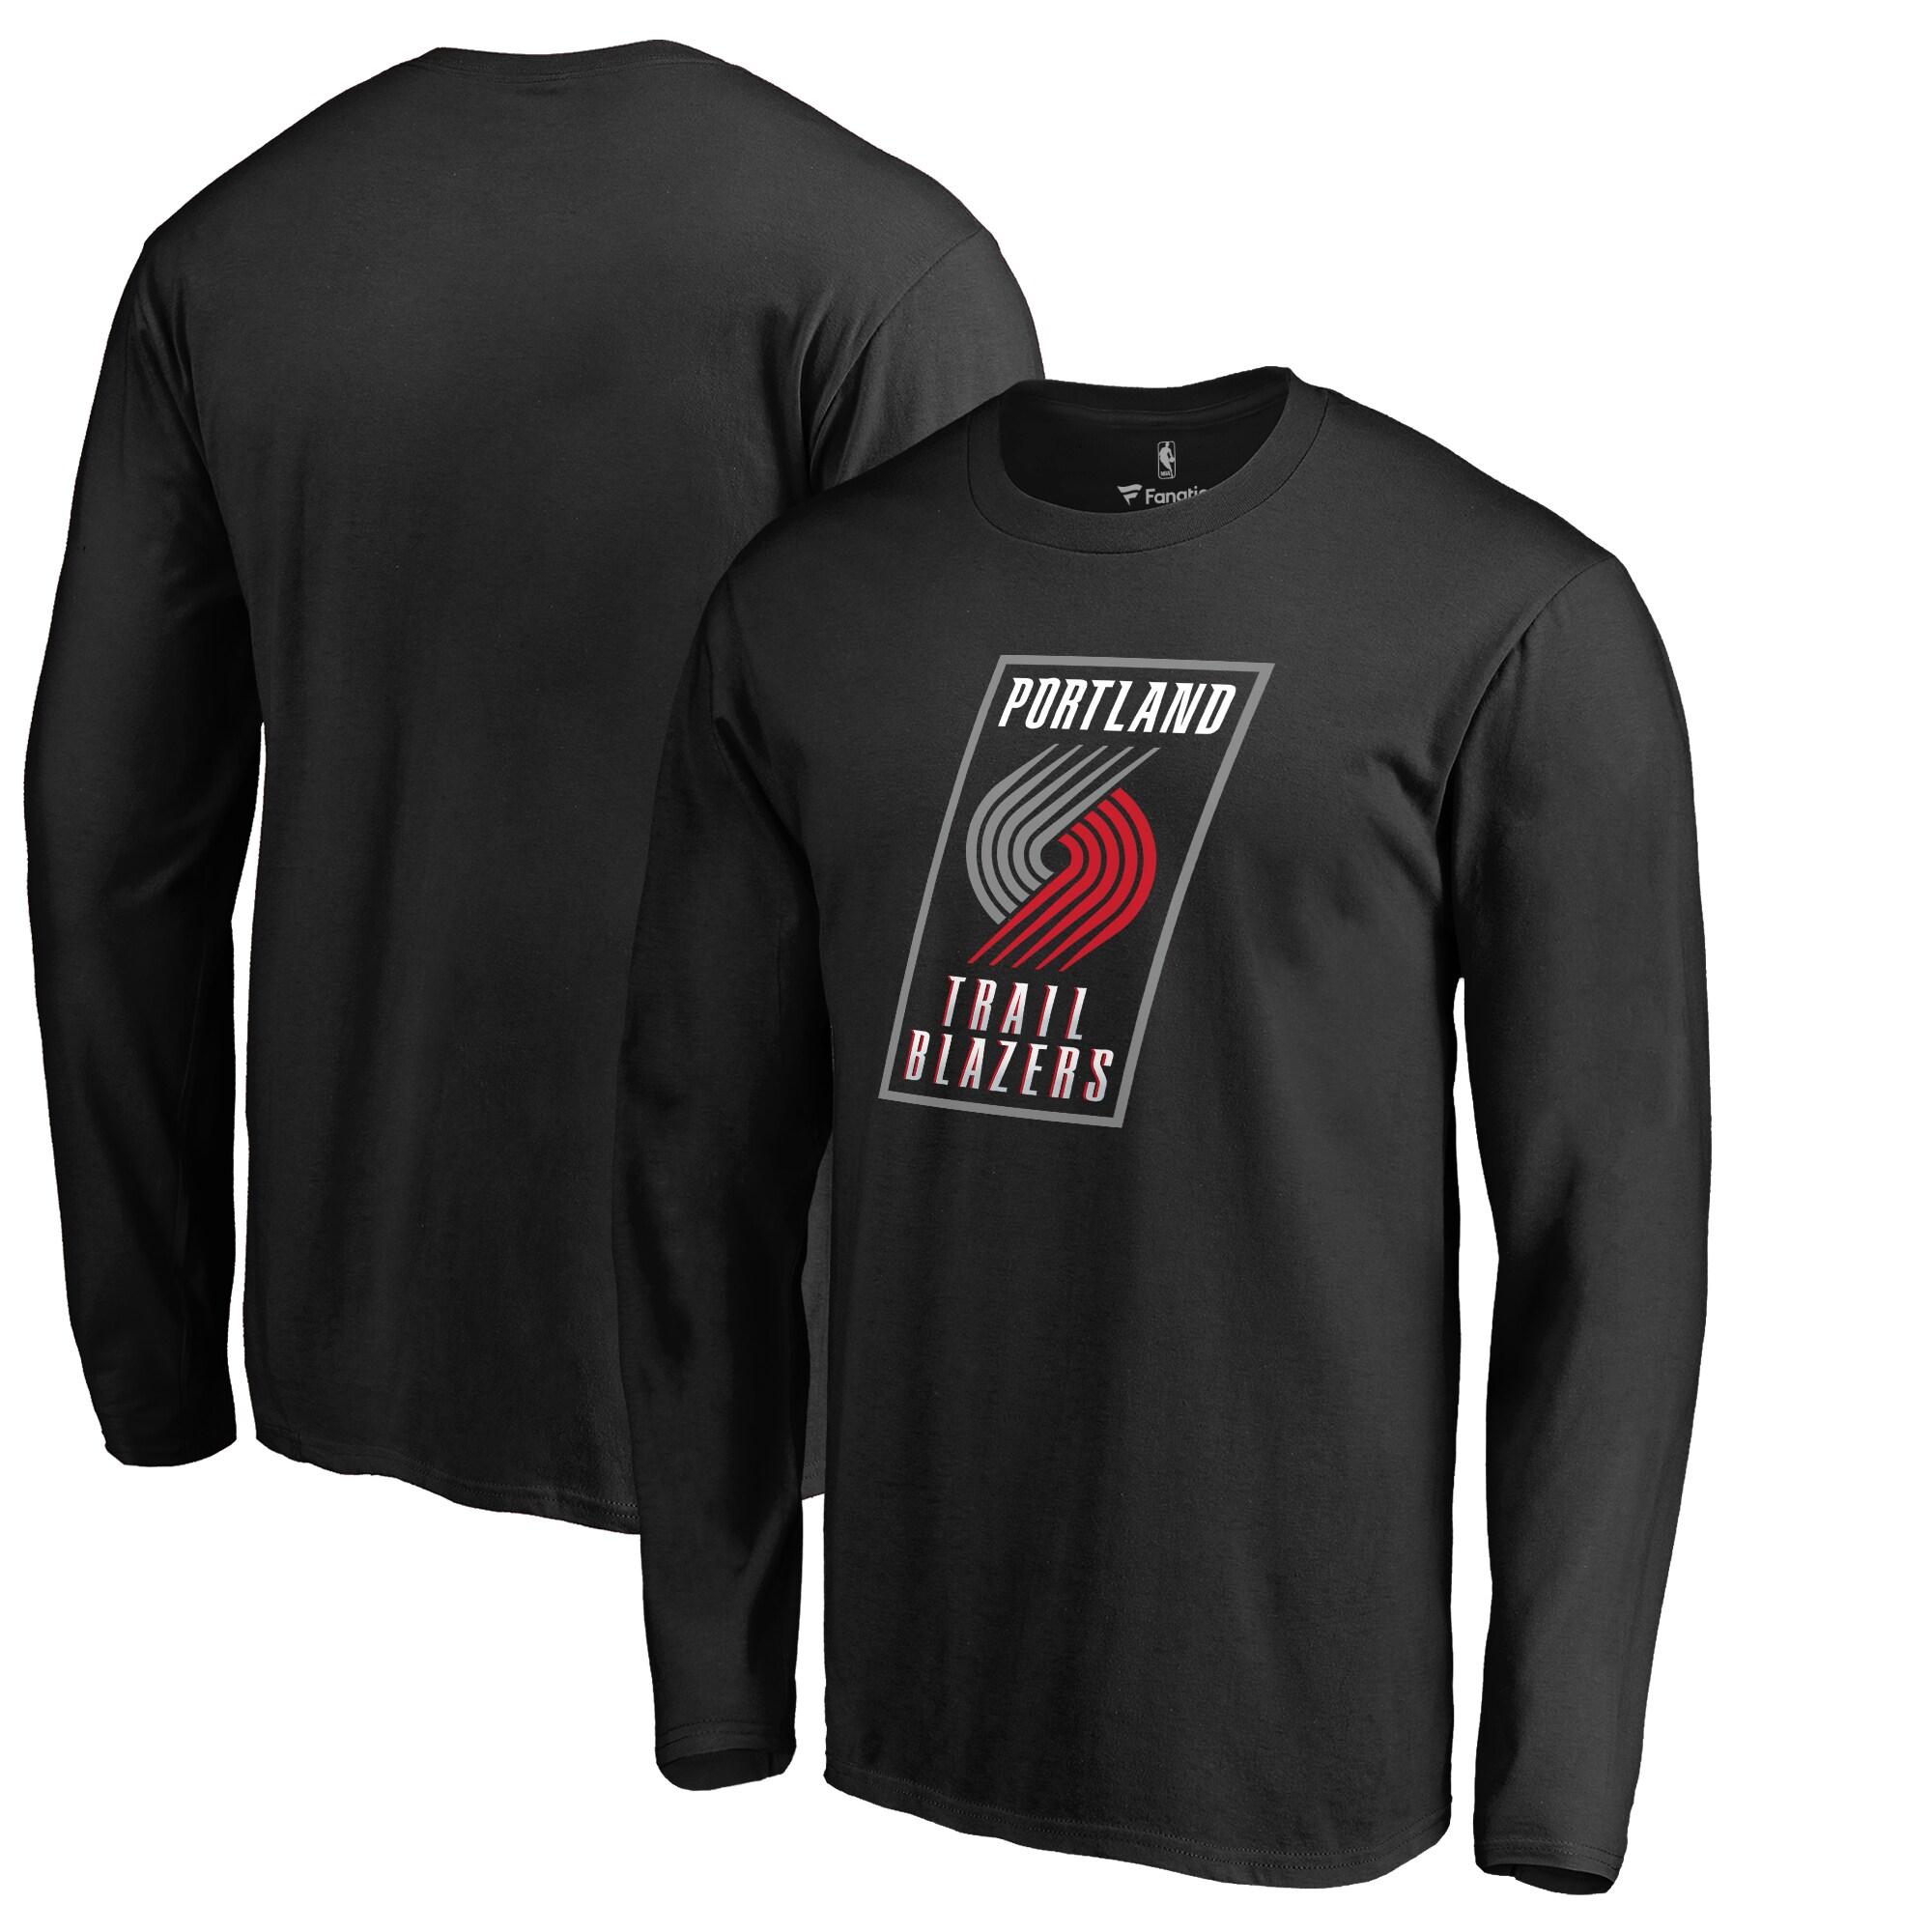 Portland Trail Blazers Primary Logo Long Sleeve T-Shirt - Black